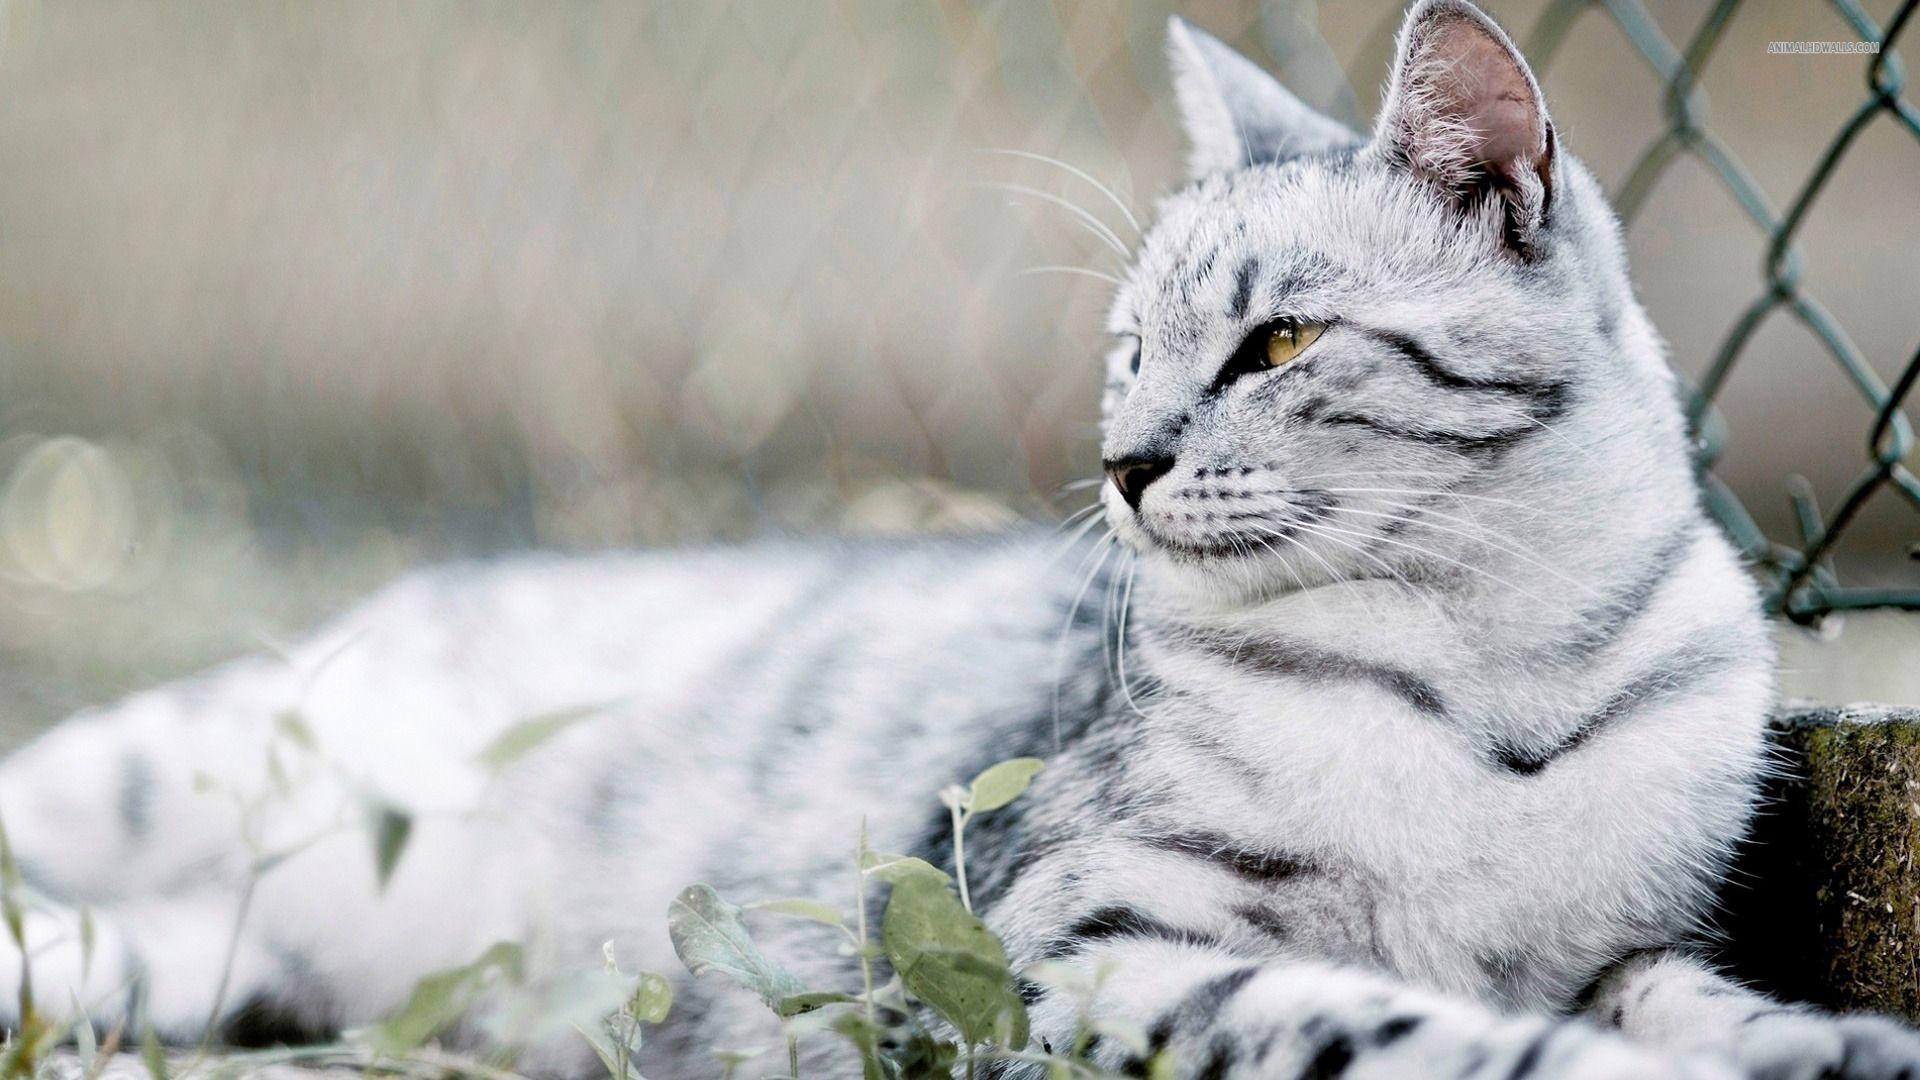 High Resolution Cute Animal Kitty Cat Desktop Background 12 .